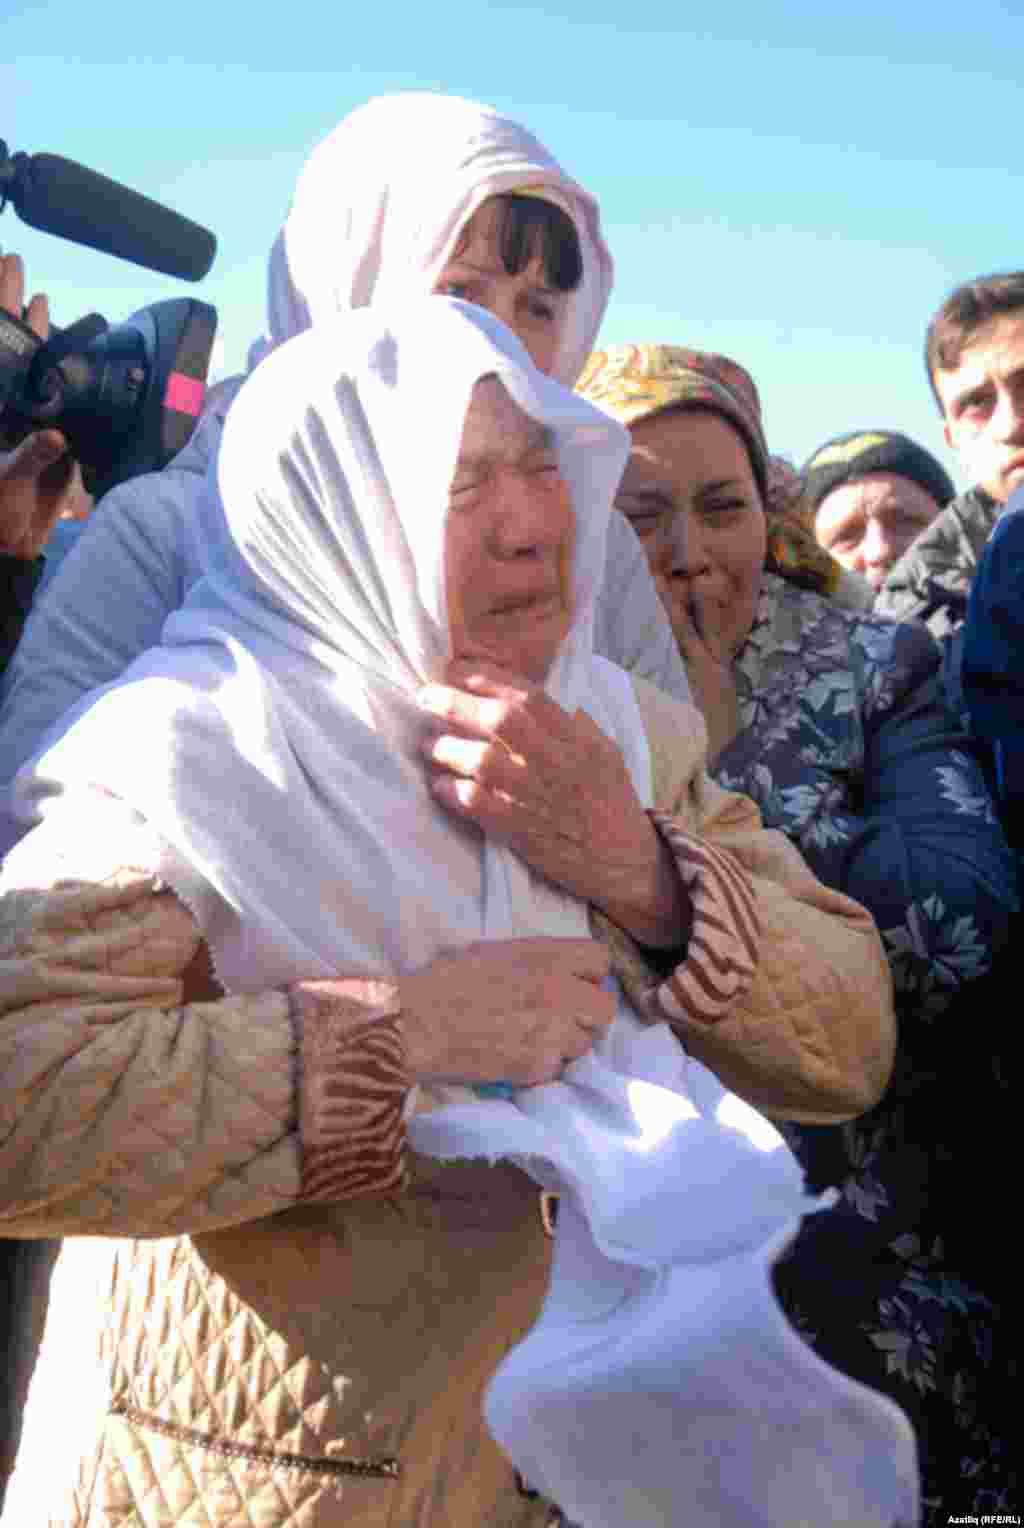 Reshat Ametov's mother Rafika